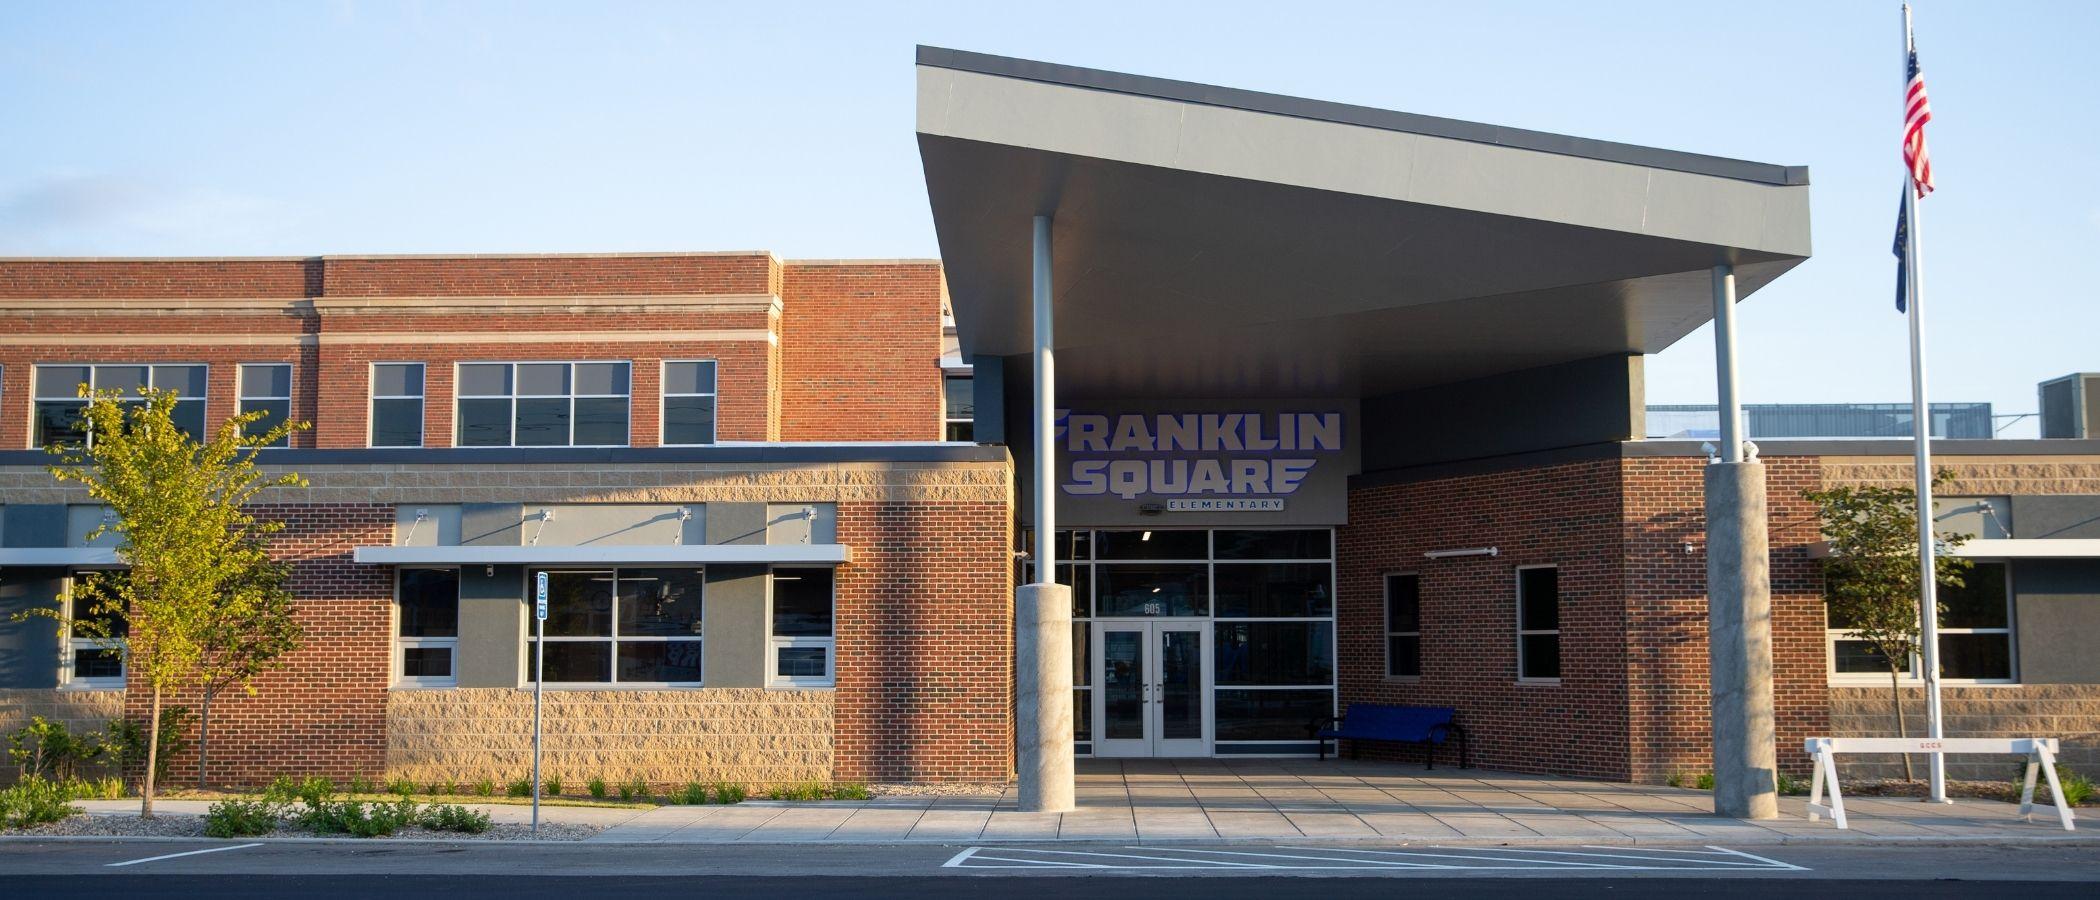 Franklin Square Elementary Entrance image